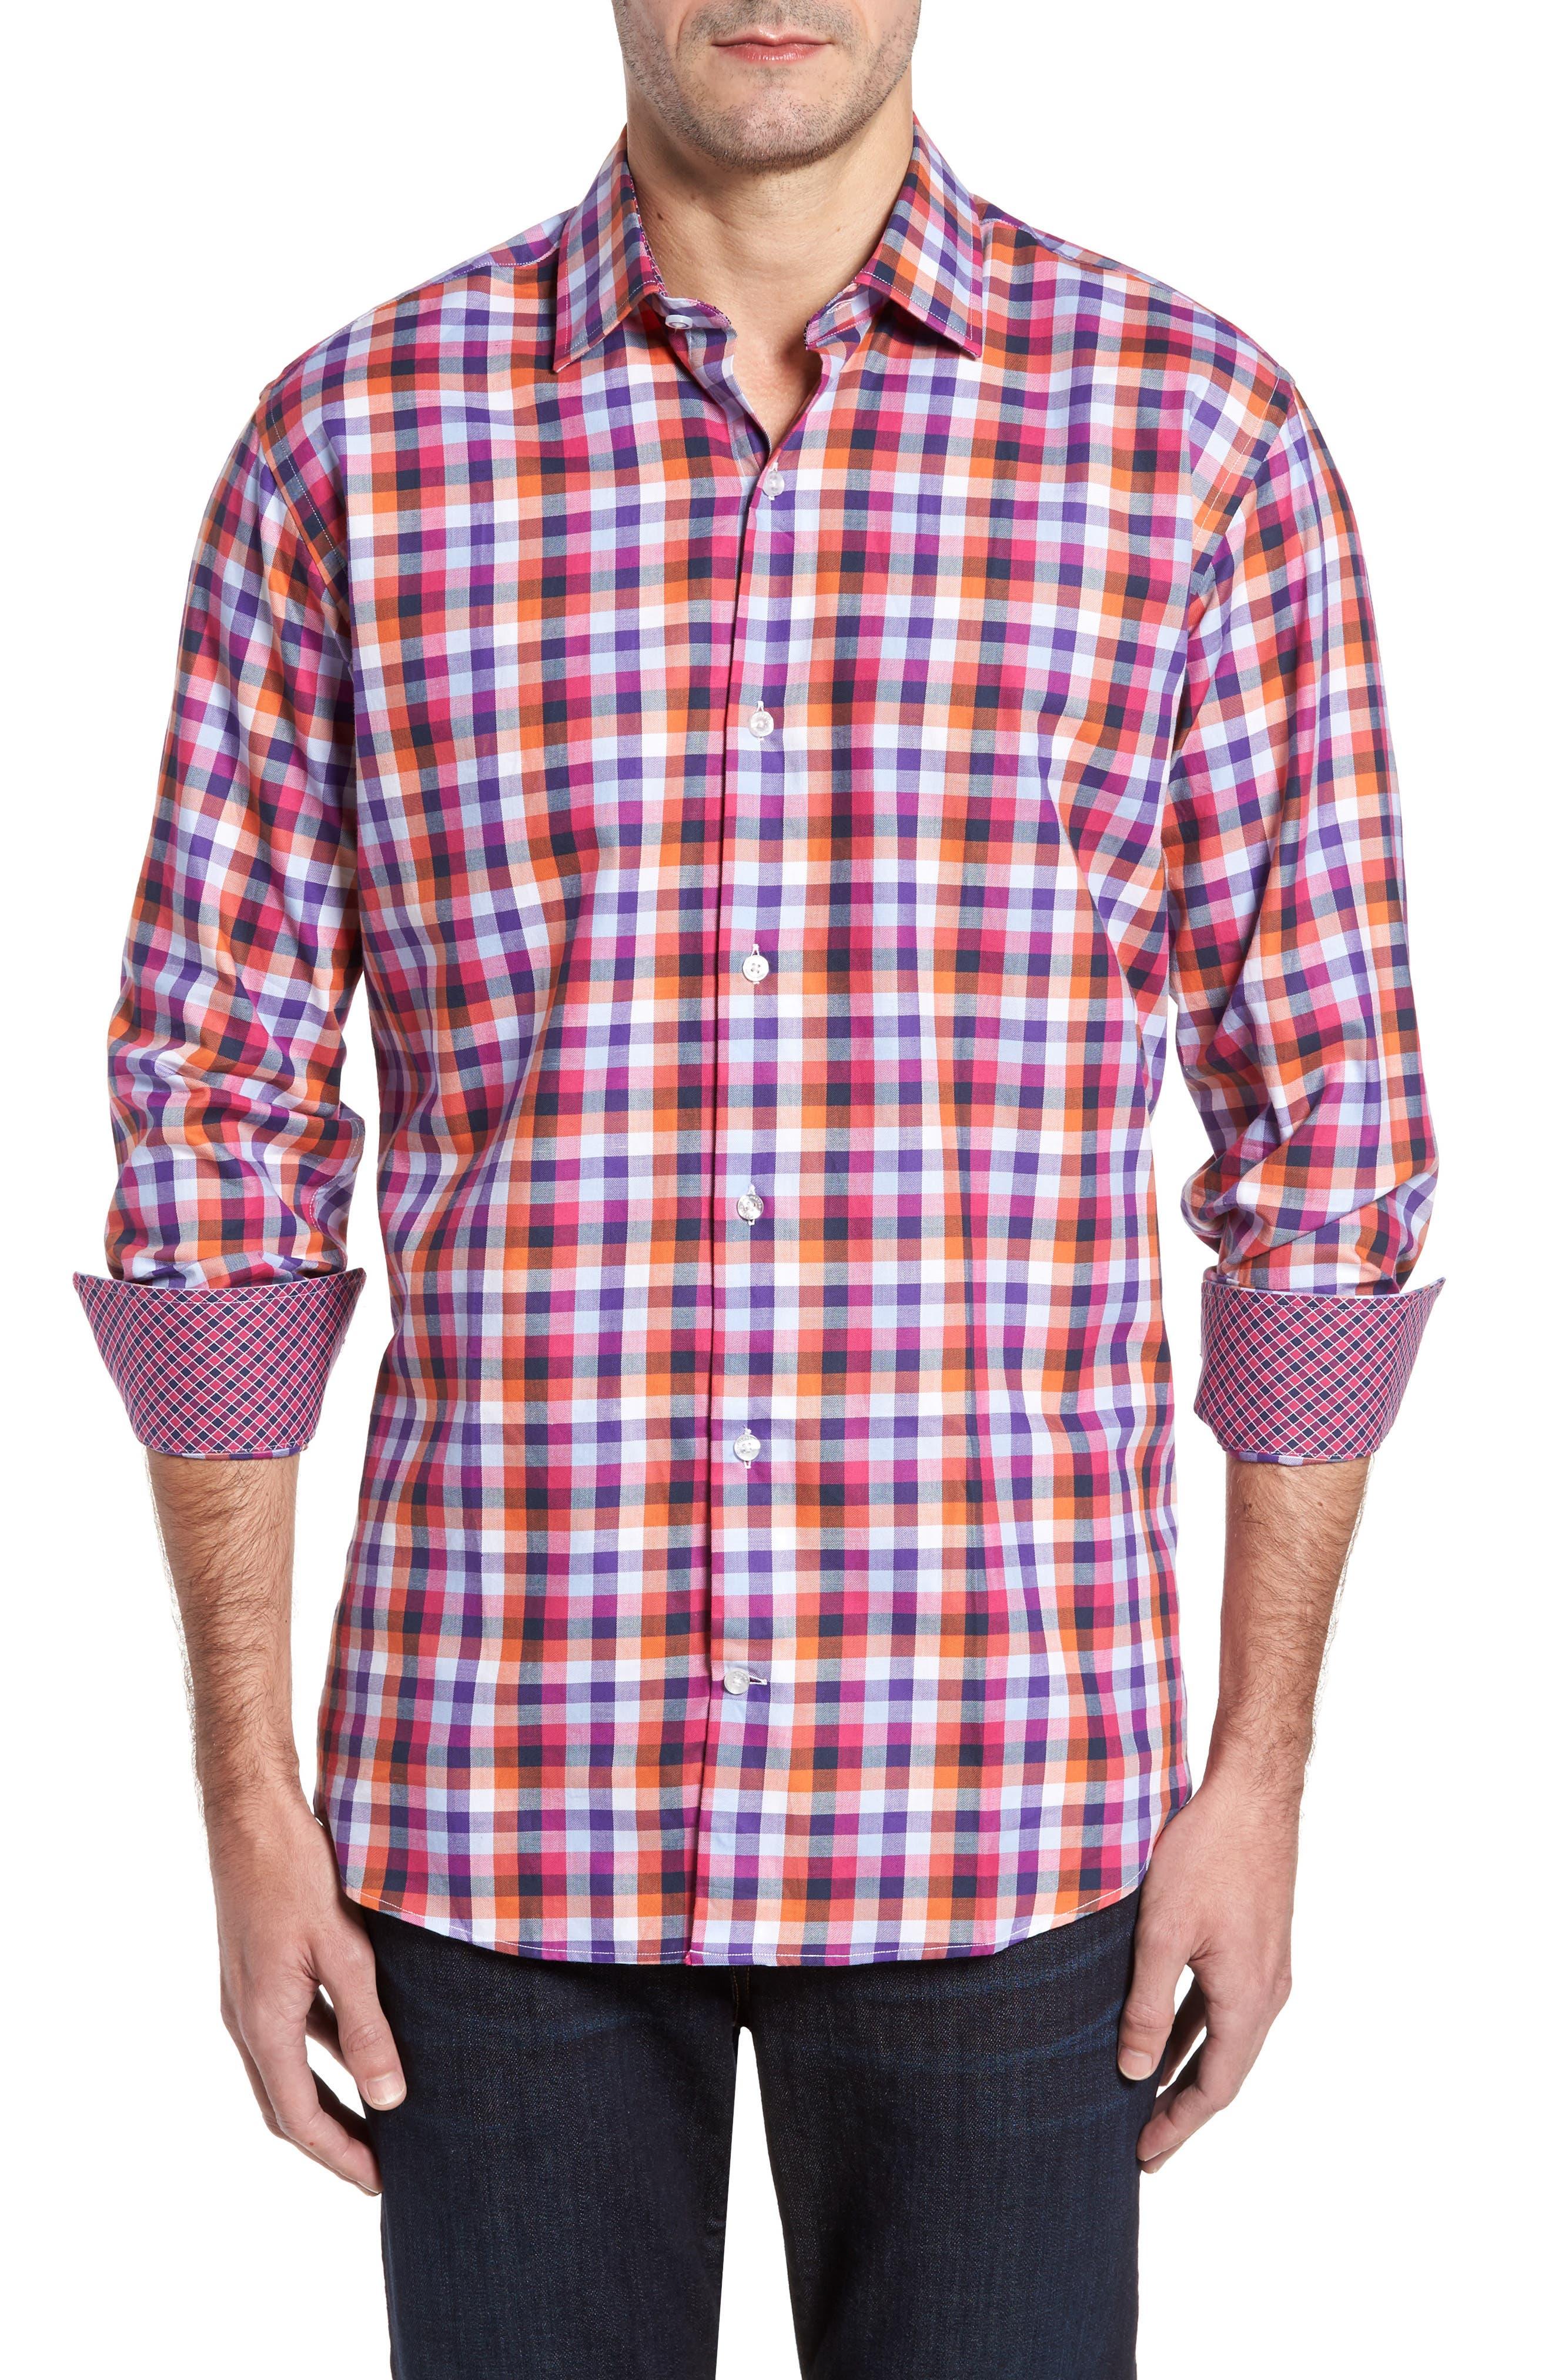 Main Image - TailorByrd Baker Check Sport Shirt